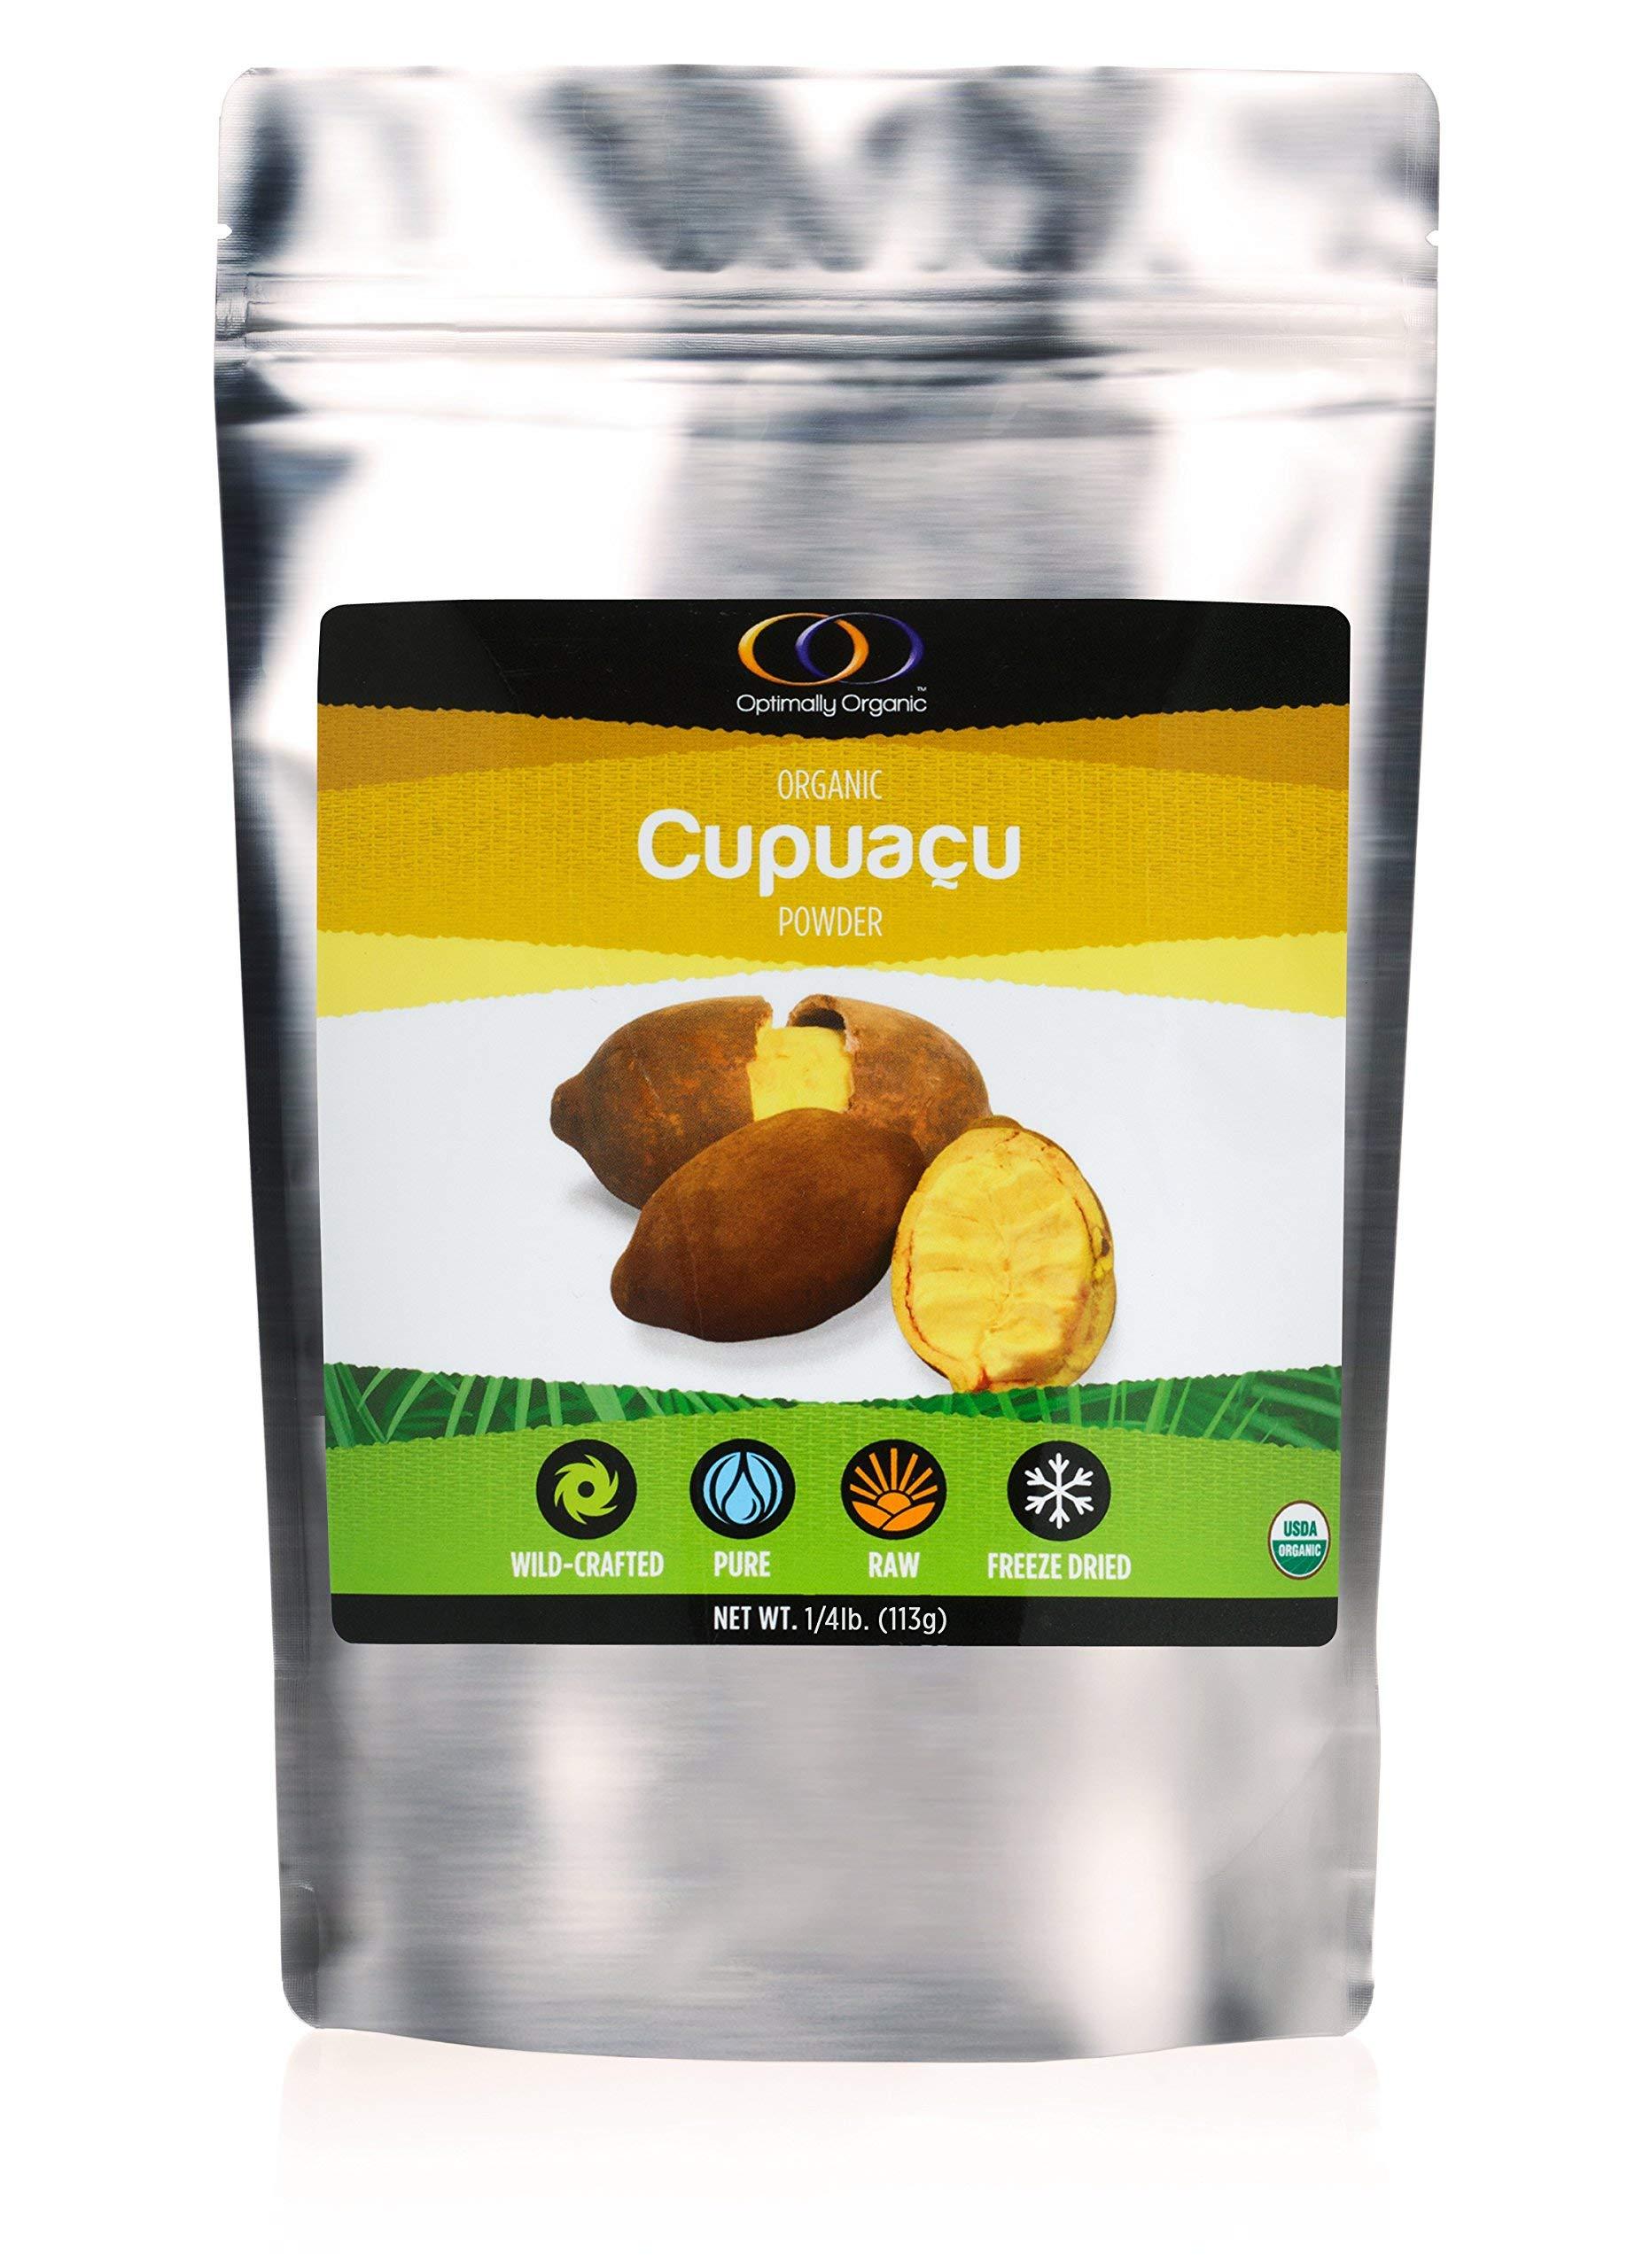 Wild-Crafted Cupuacu Powder, 1/4 Lb, All Natural, Raw, Essential Nutrients